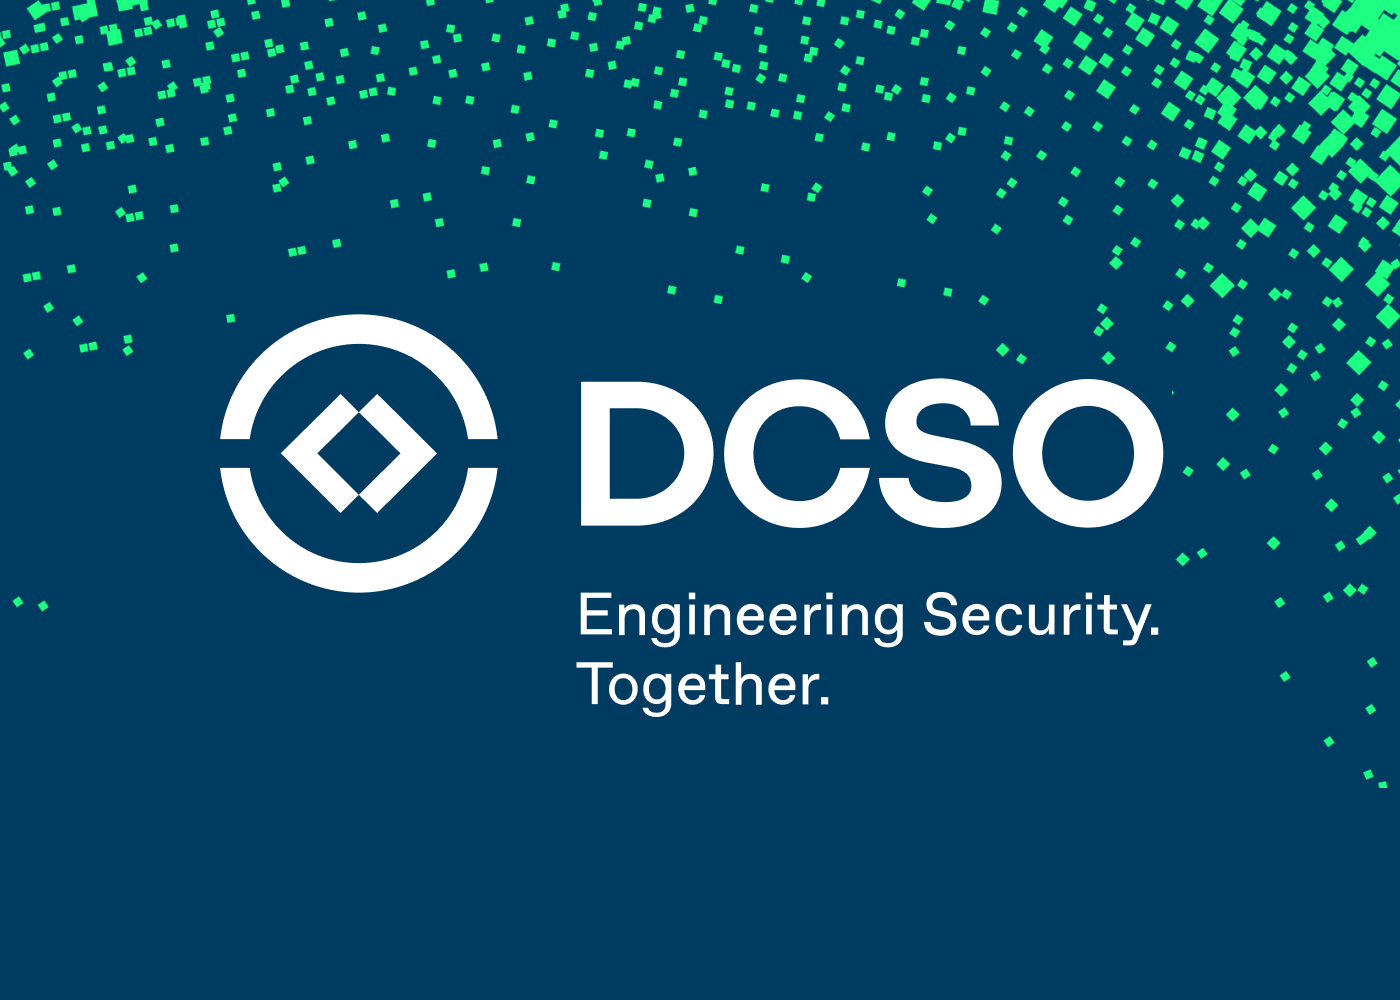 DCSO Markenprozess